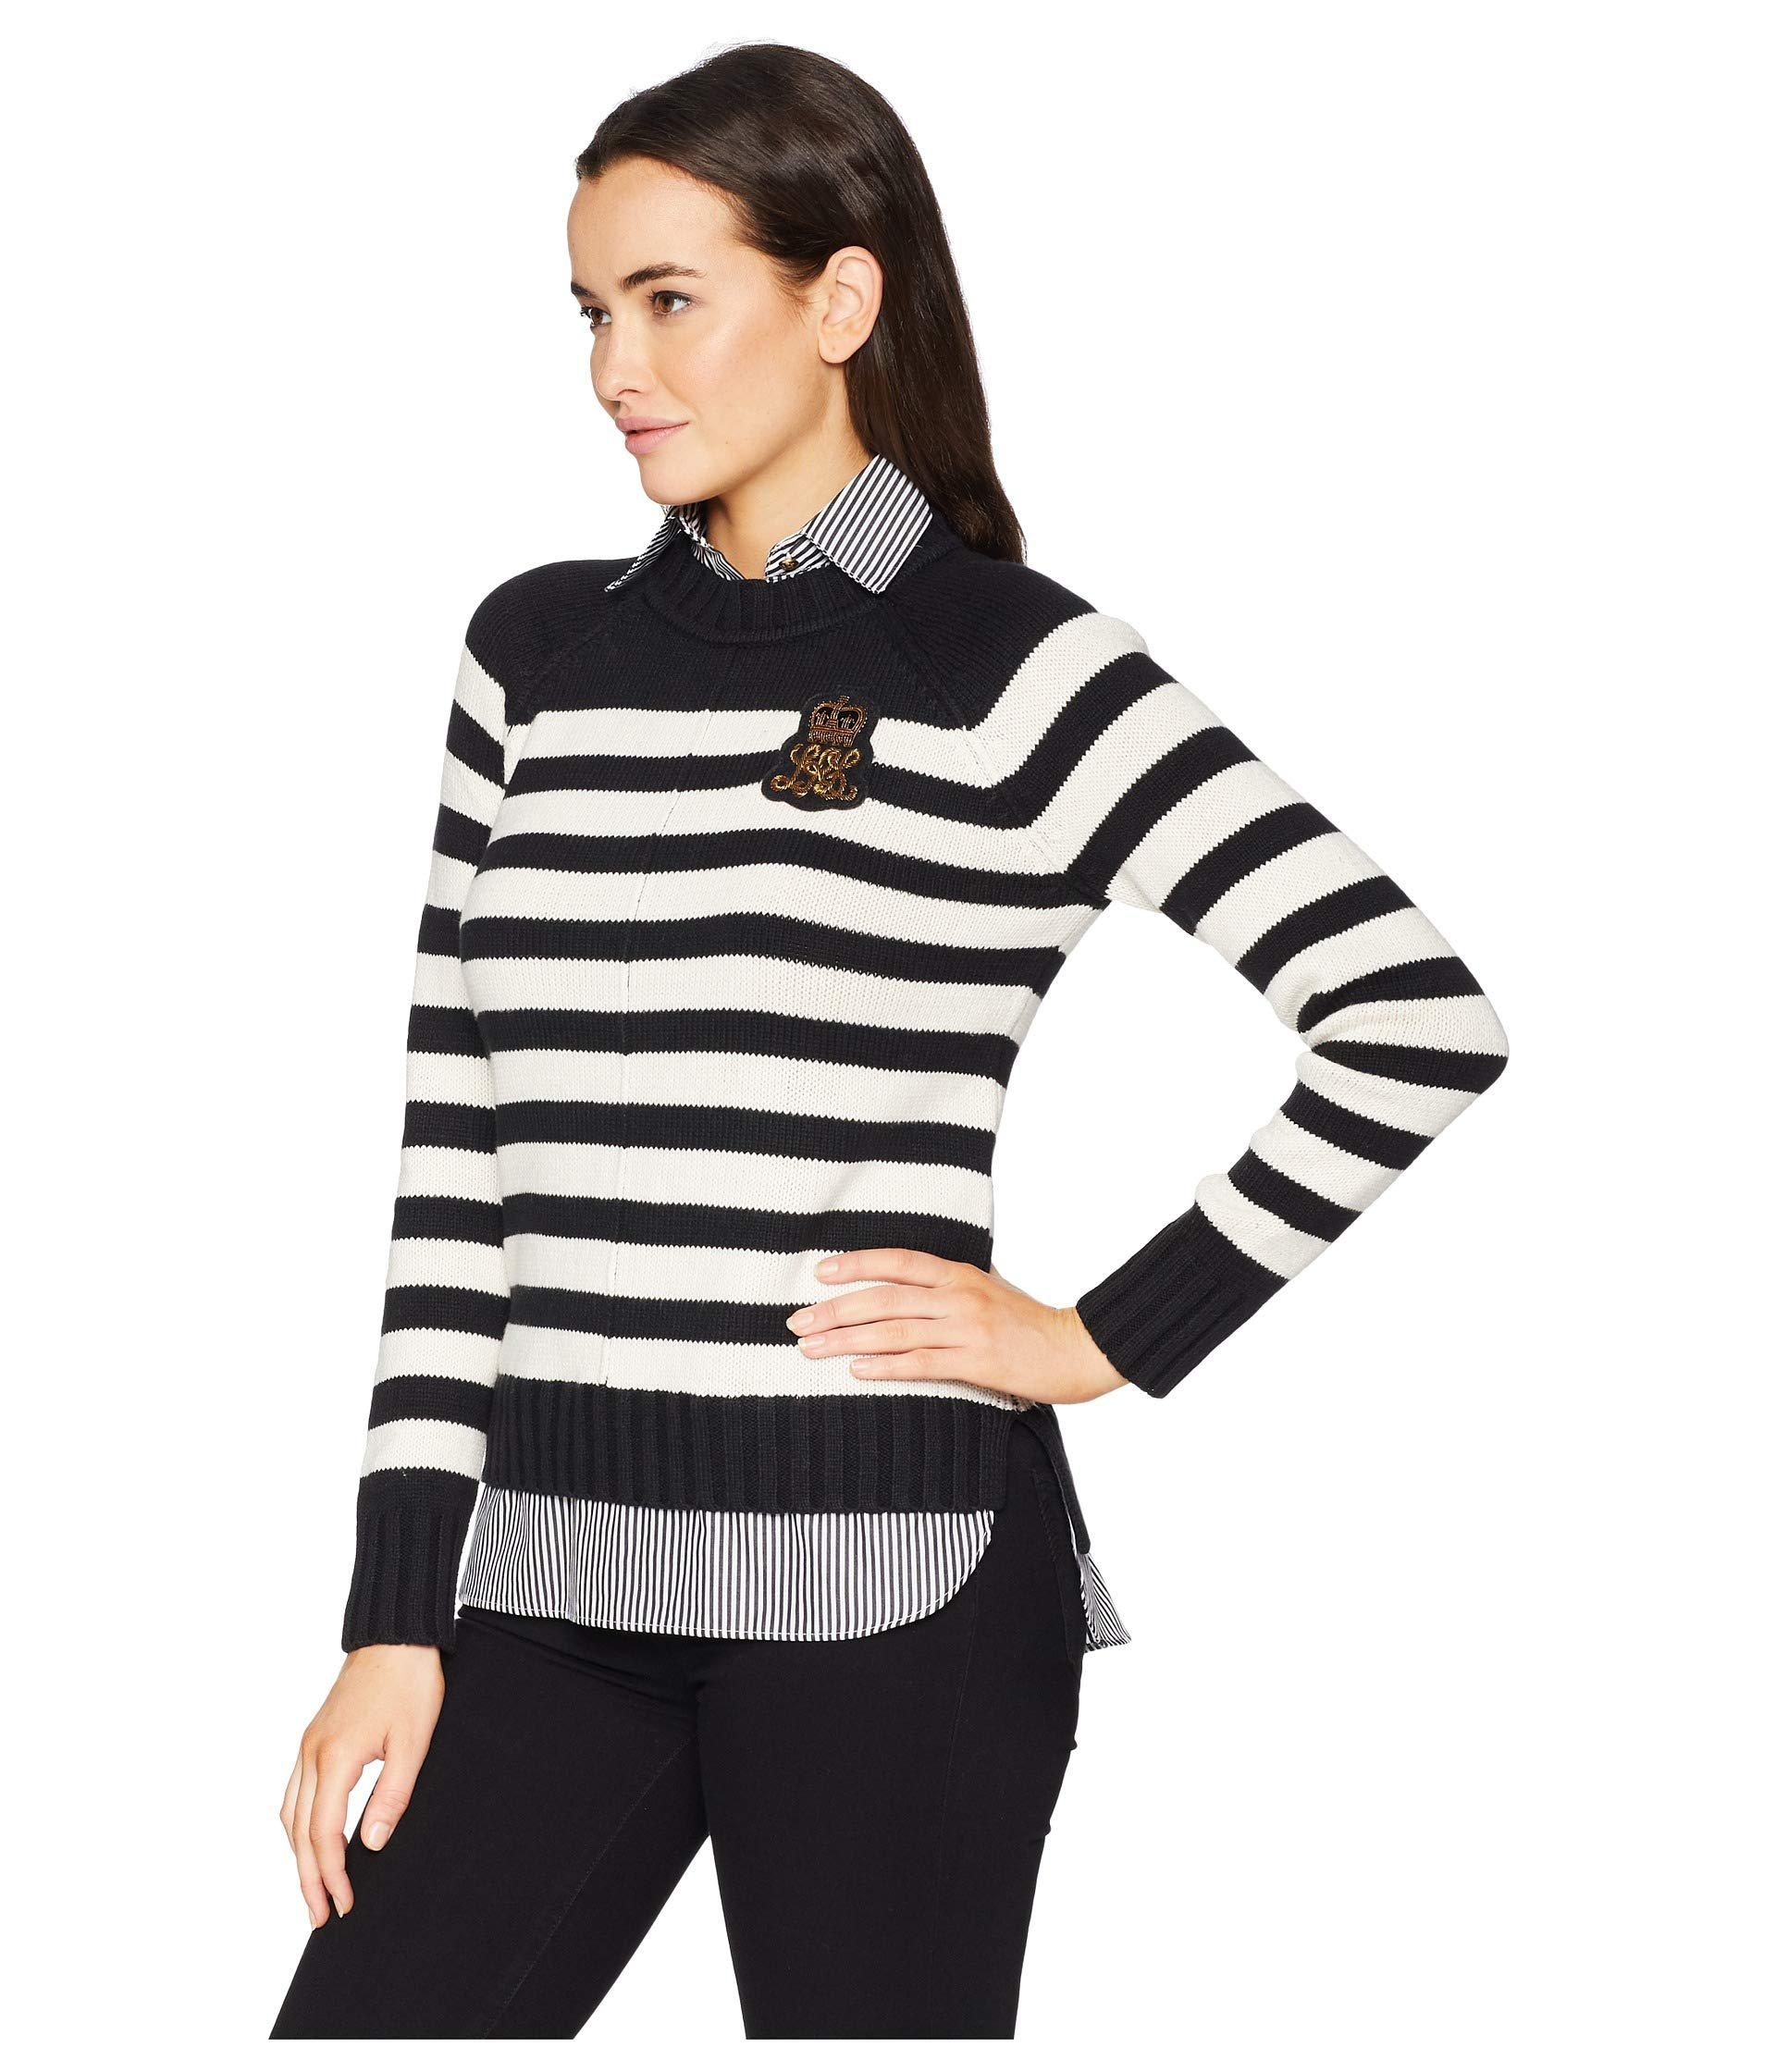 Lyst - Lauren by Ralph Lauren Bullion-patch Layered Shirt in Black - Save  33.0% 5da23ab04310